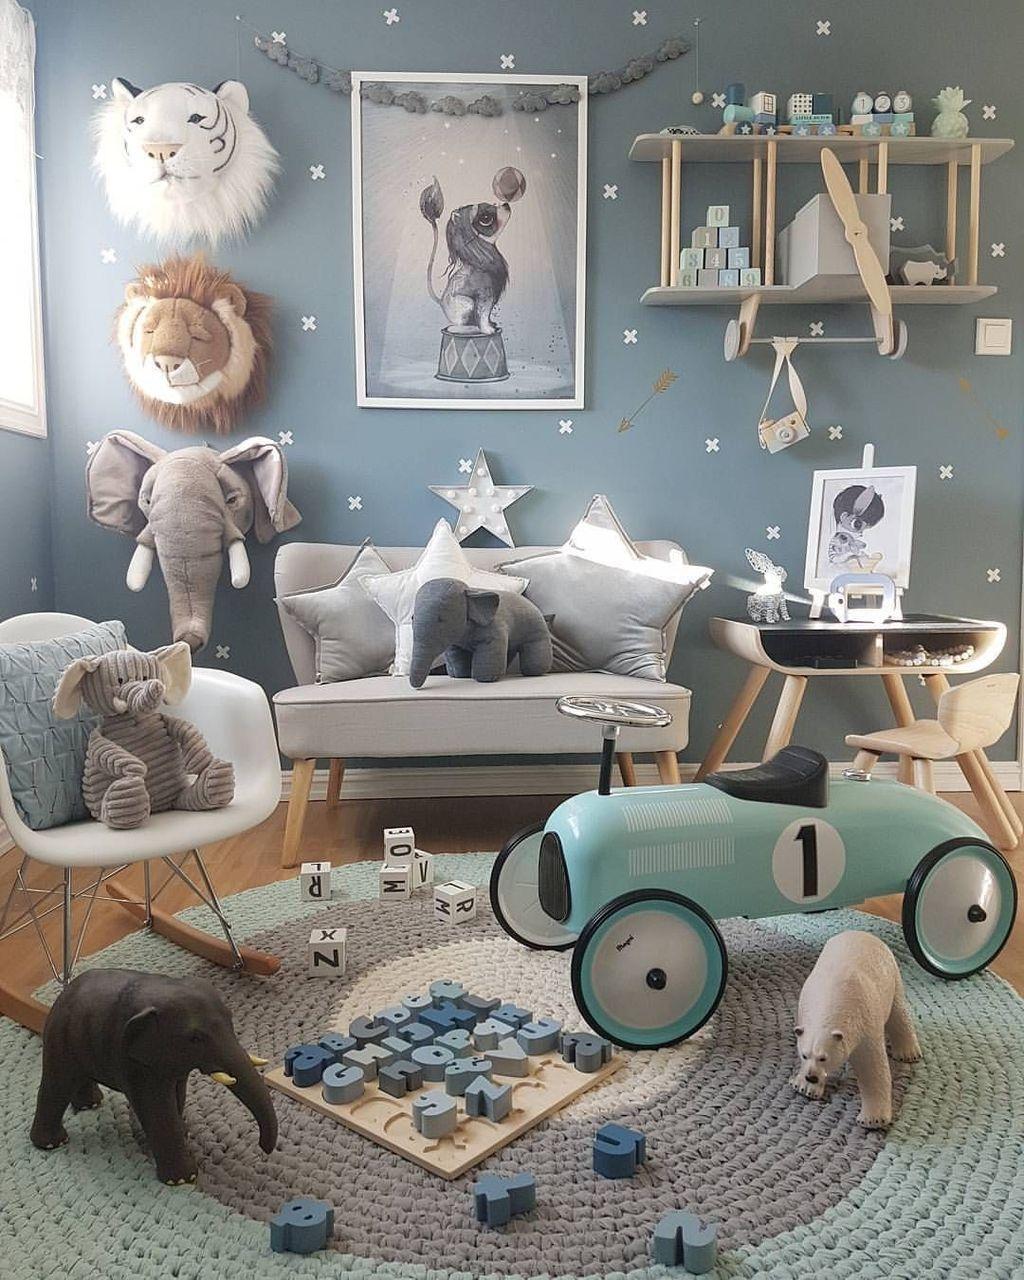 Adorable Disney Room Design Ideas For Your Childrens Room 45